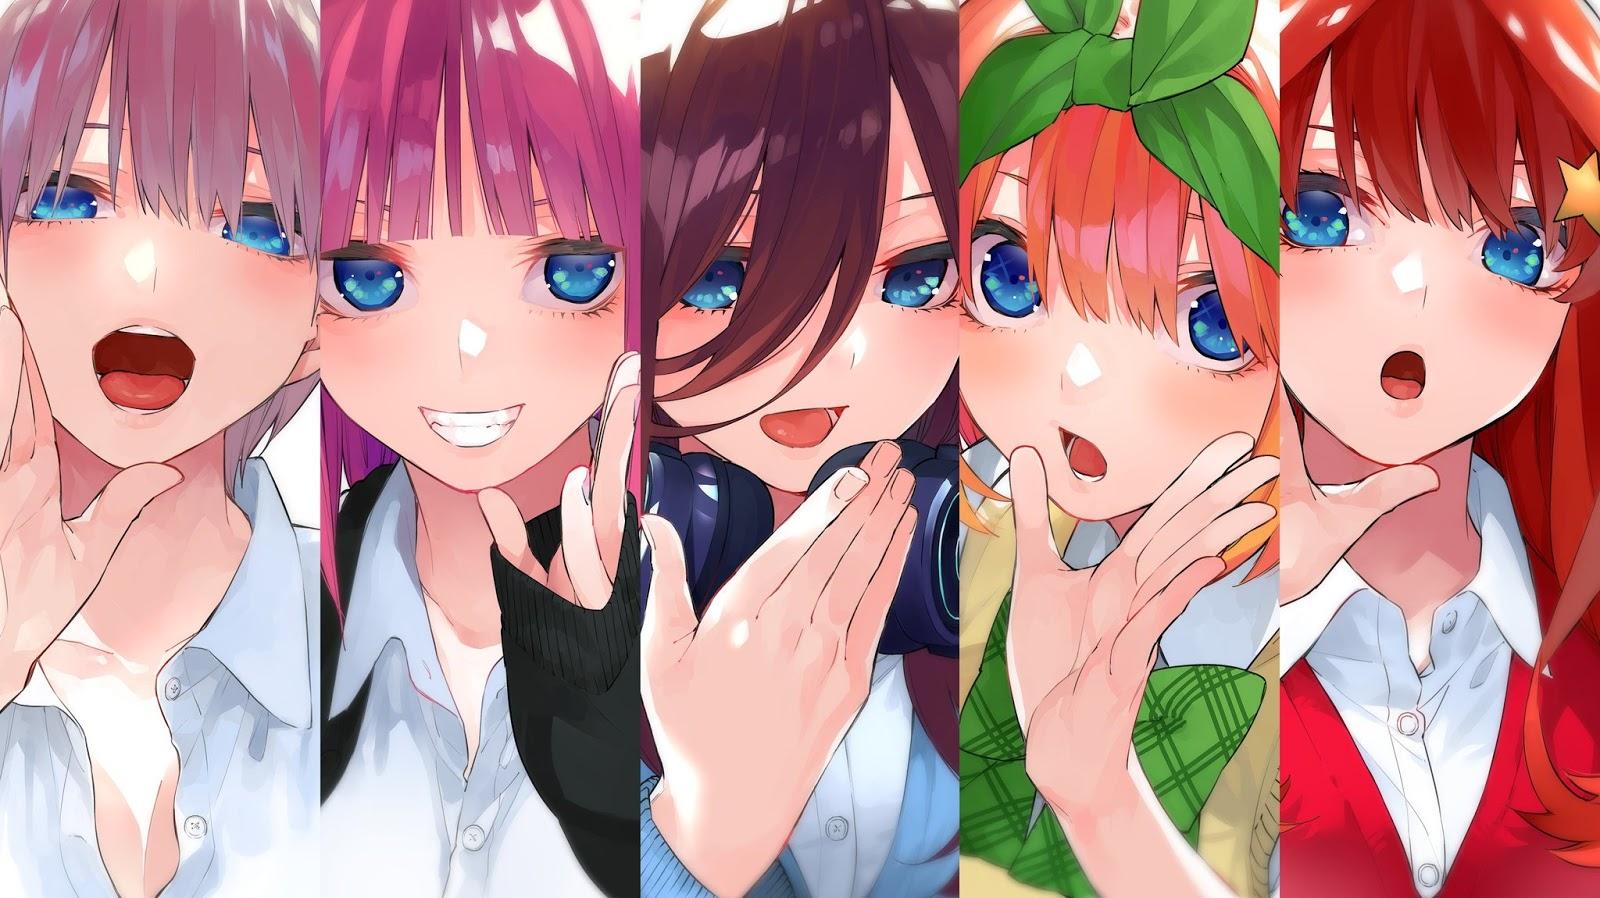 Go-Toubun no Hanayome (The Quintessential Quintuplets) terminará en su tomo 14.